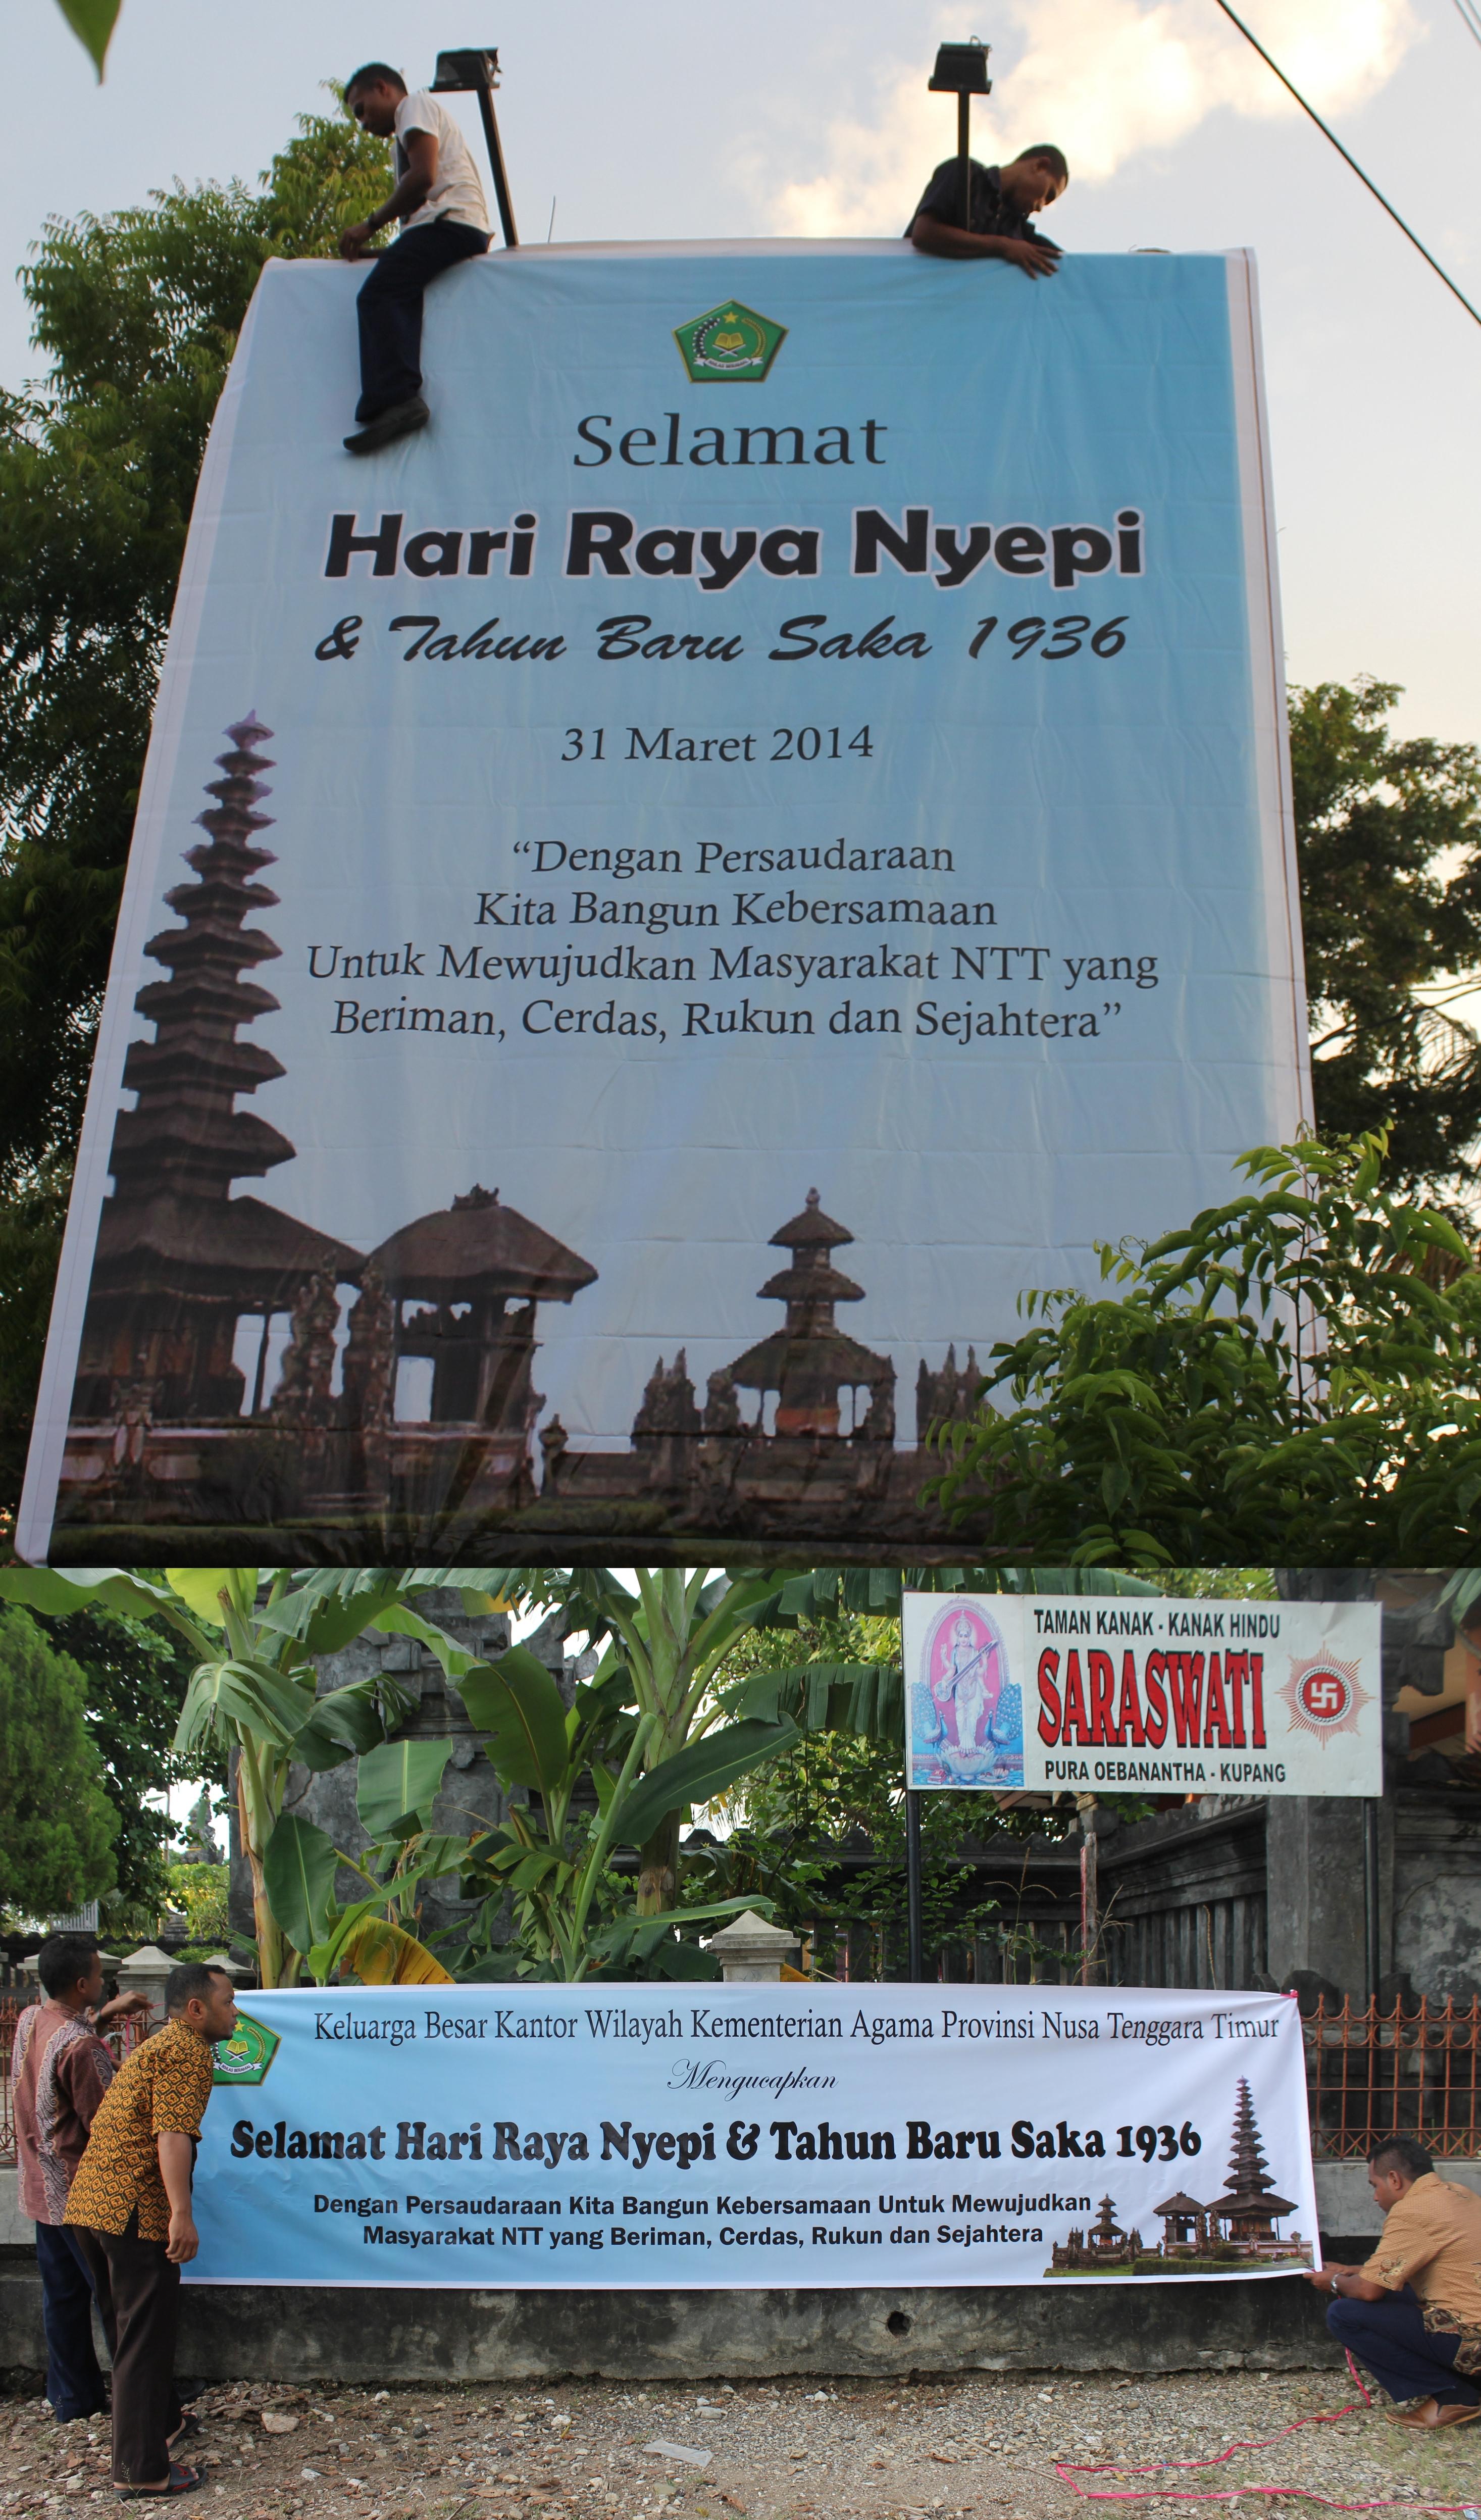 Sambut Nyepi Baliho Spanduk Dipasang Kanwil Kementerian Agama Foto Pura